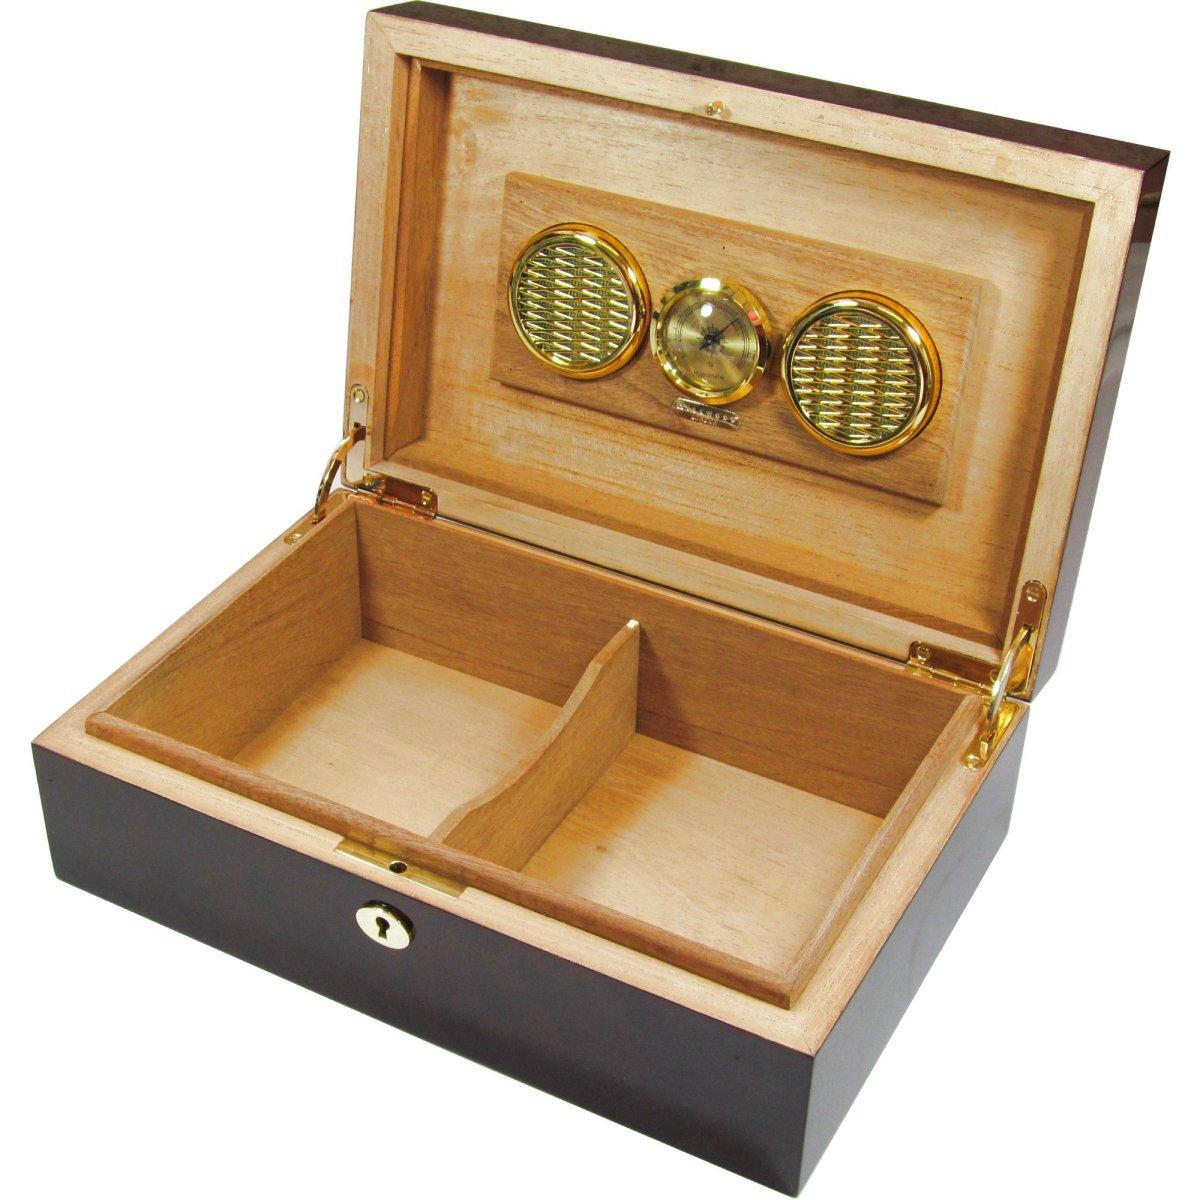 Home / Shop / Luxury Gifts / Cigar Humidors / Camphor Burl 25 Cigar ...